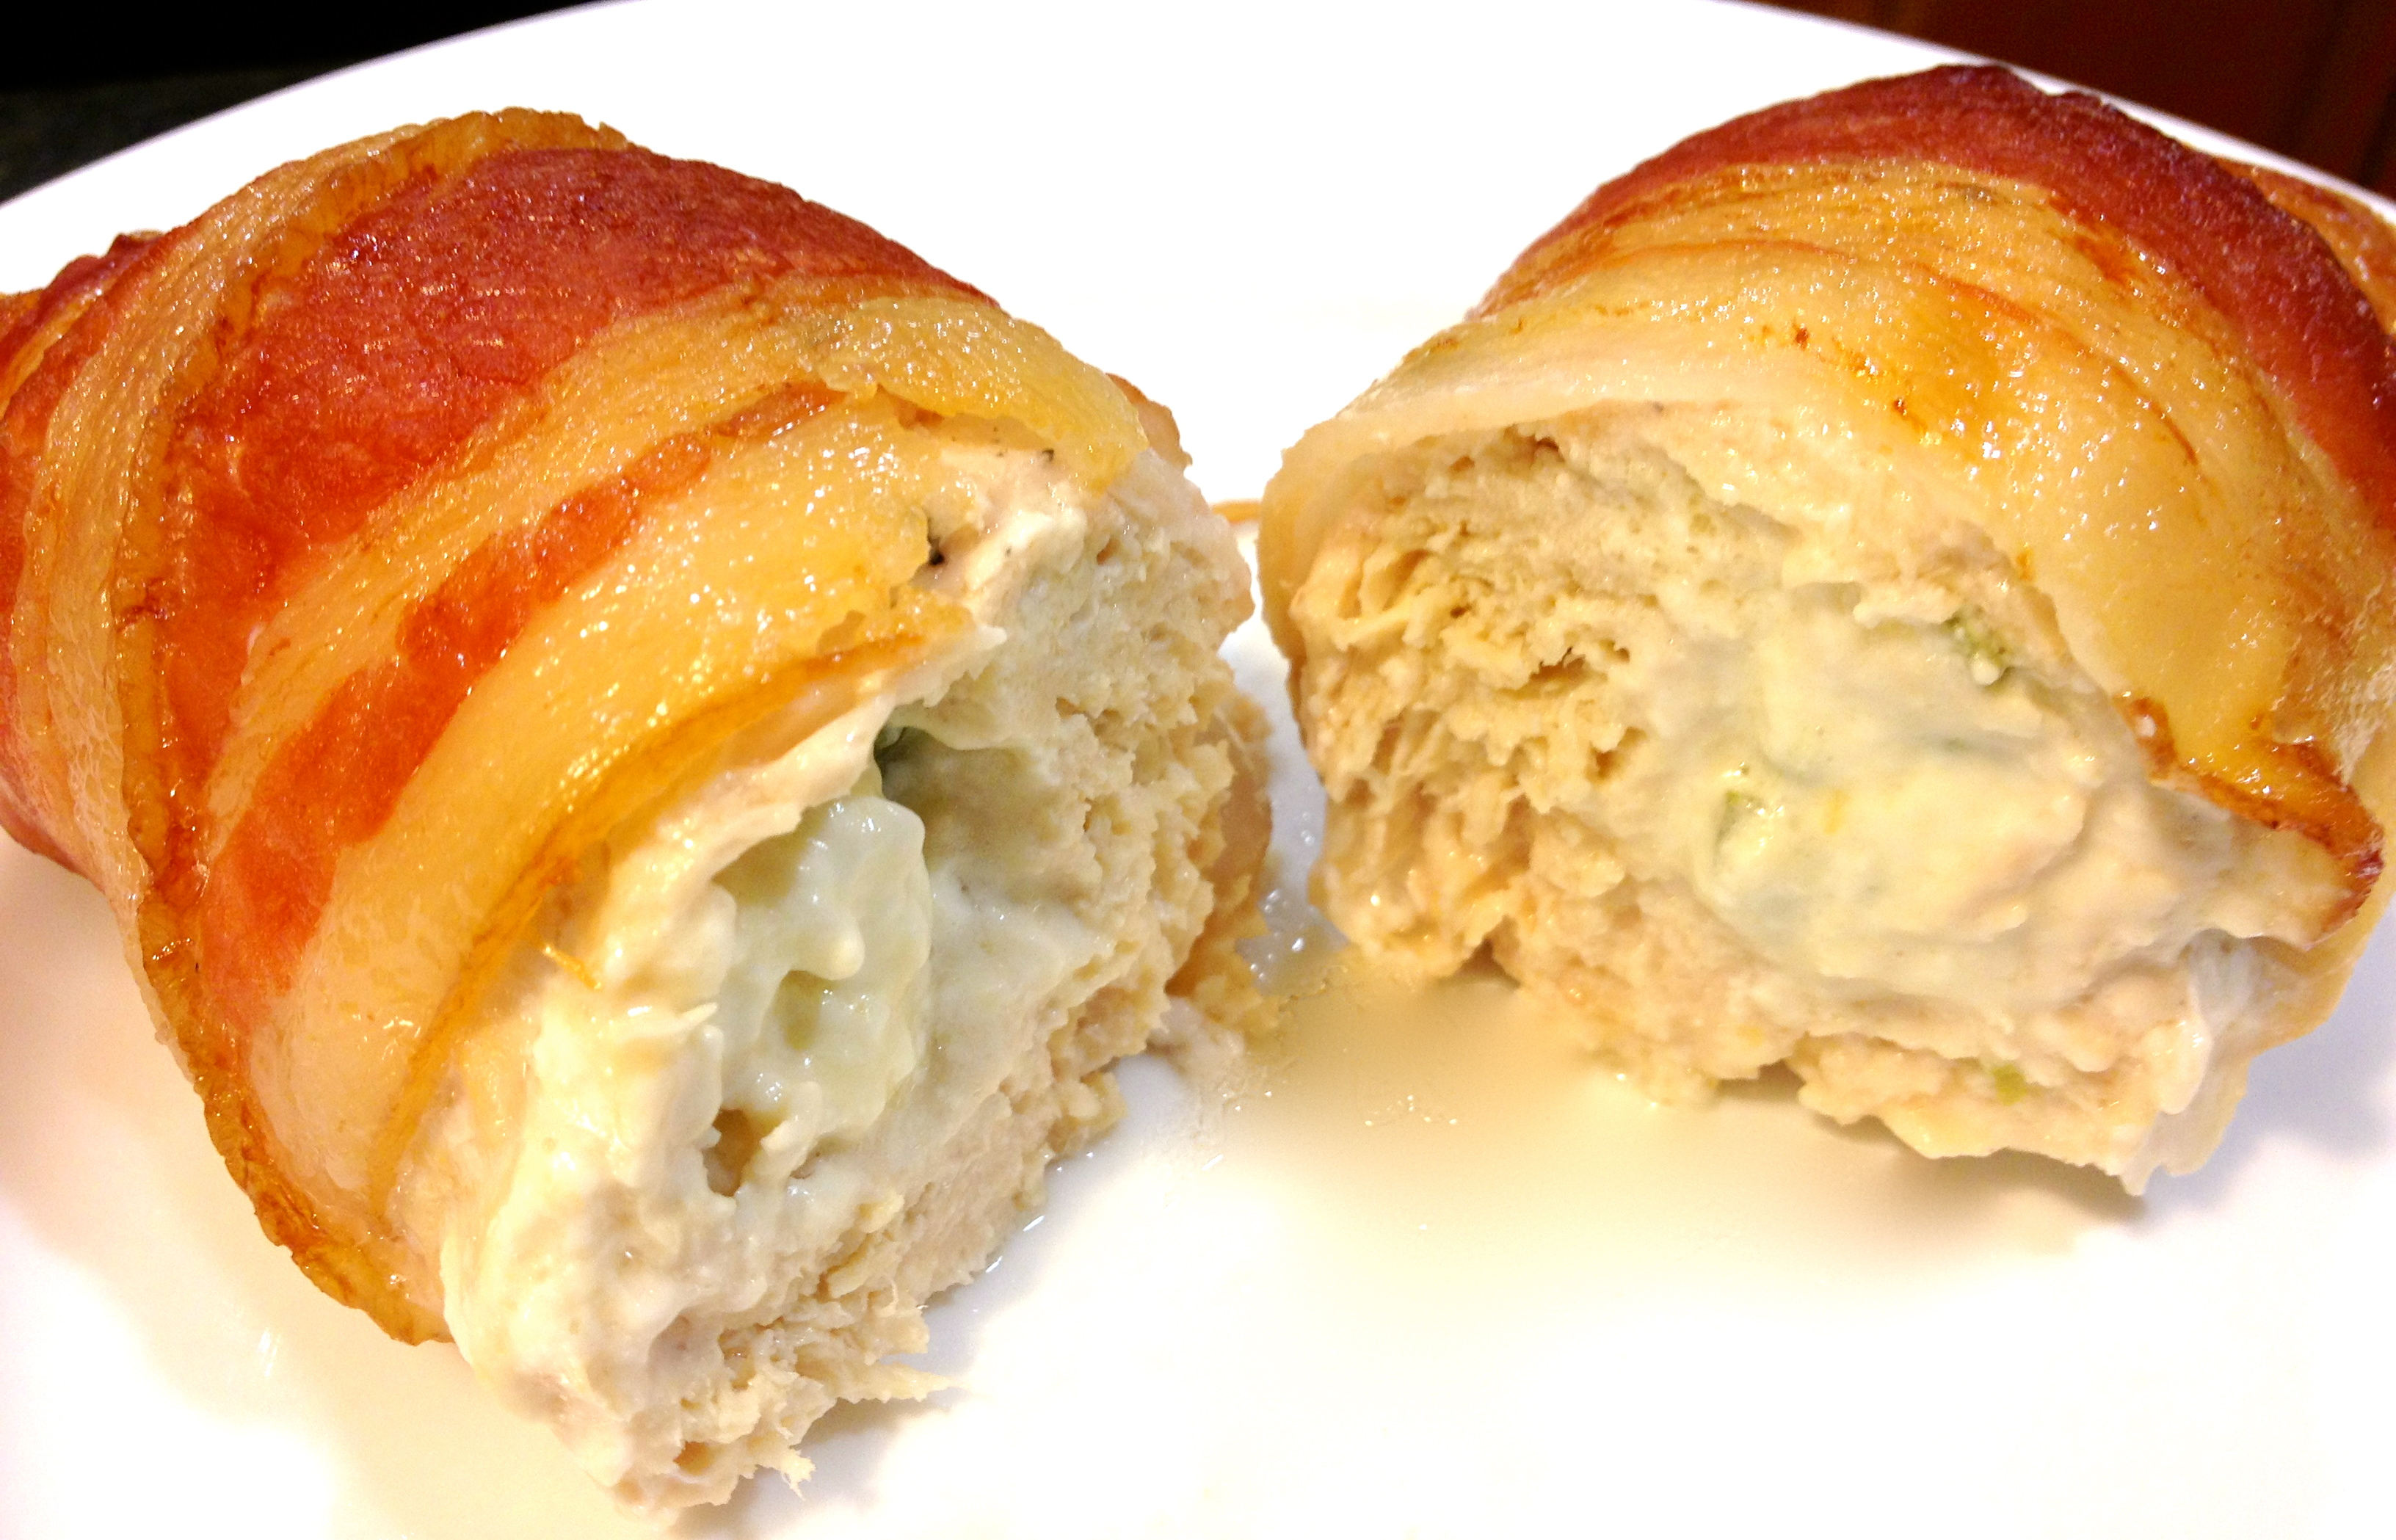 jalapeño stuffed chicken | My Imperfect Kitchen